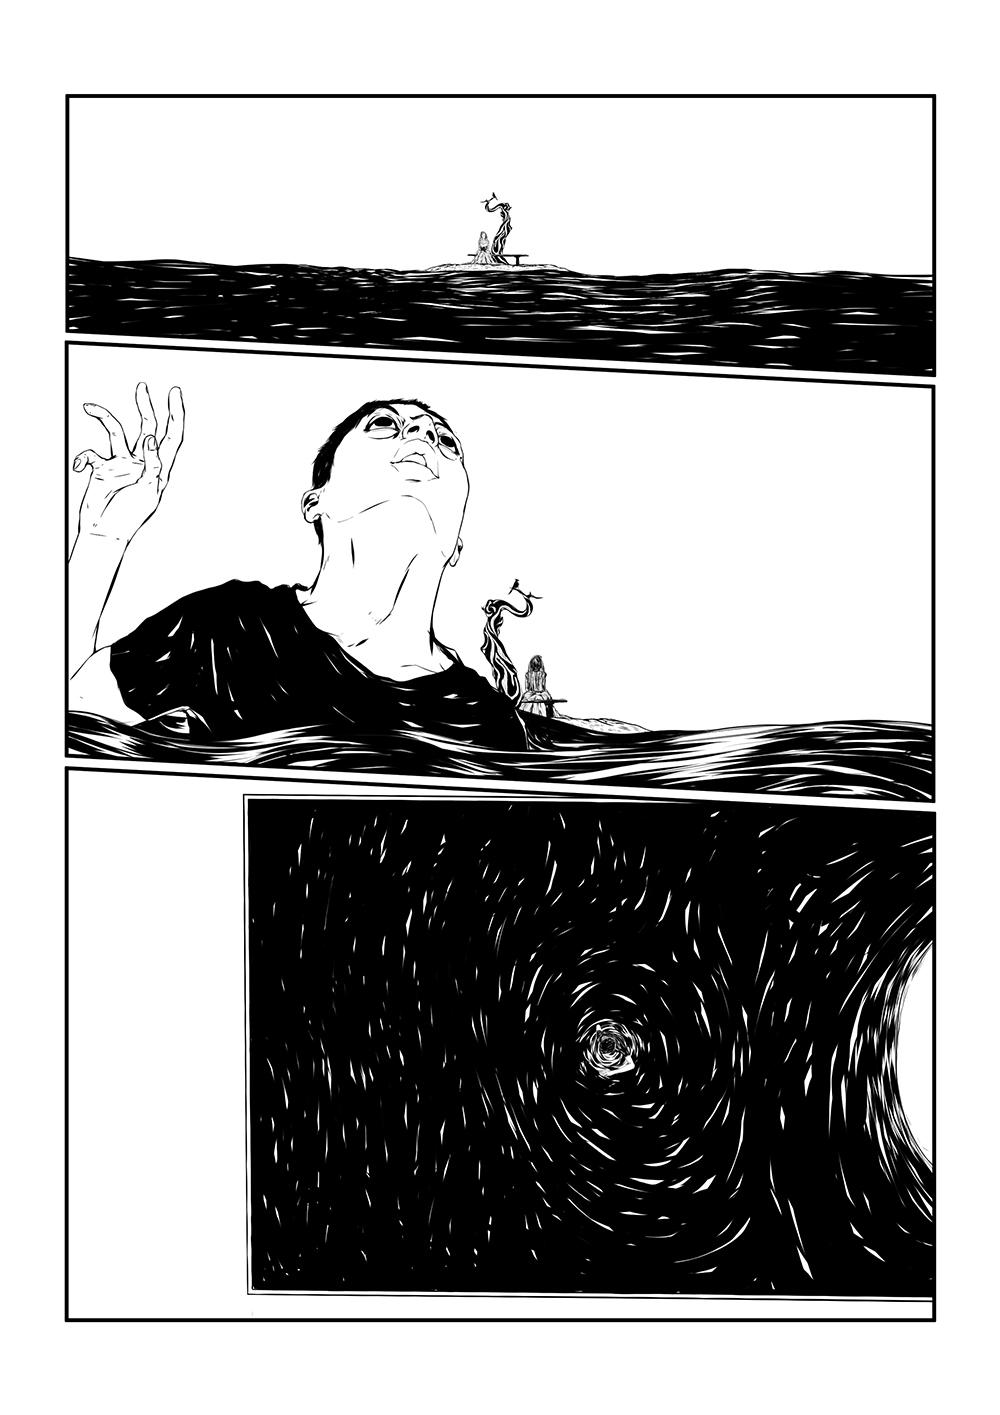 mojowang_illustration_betweenrivers_21_8.jpg